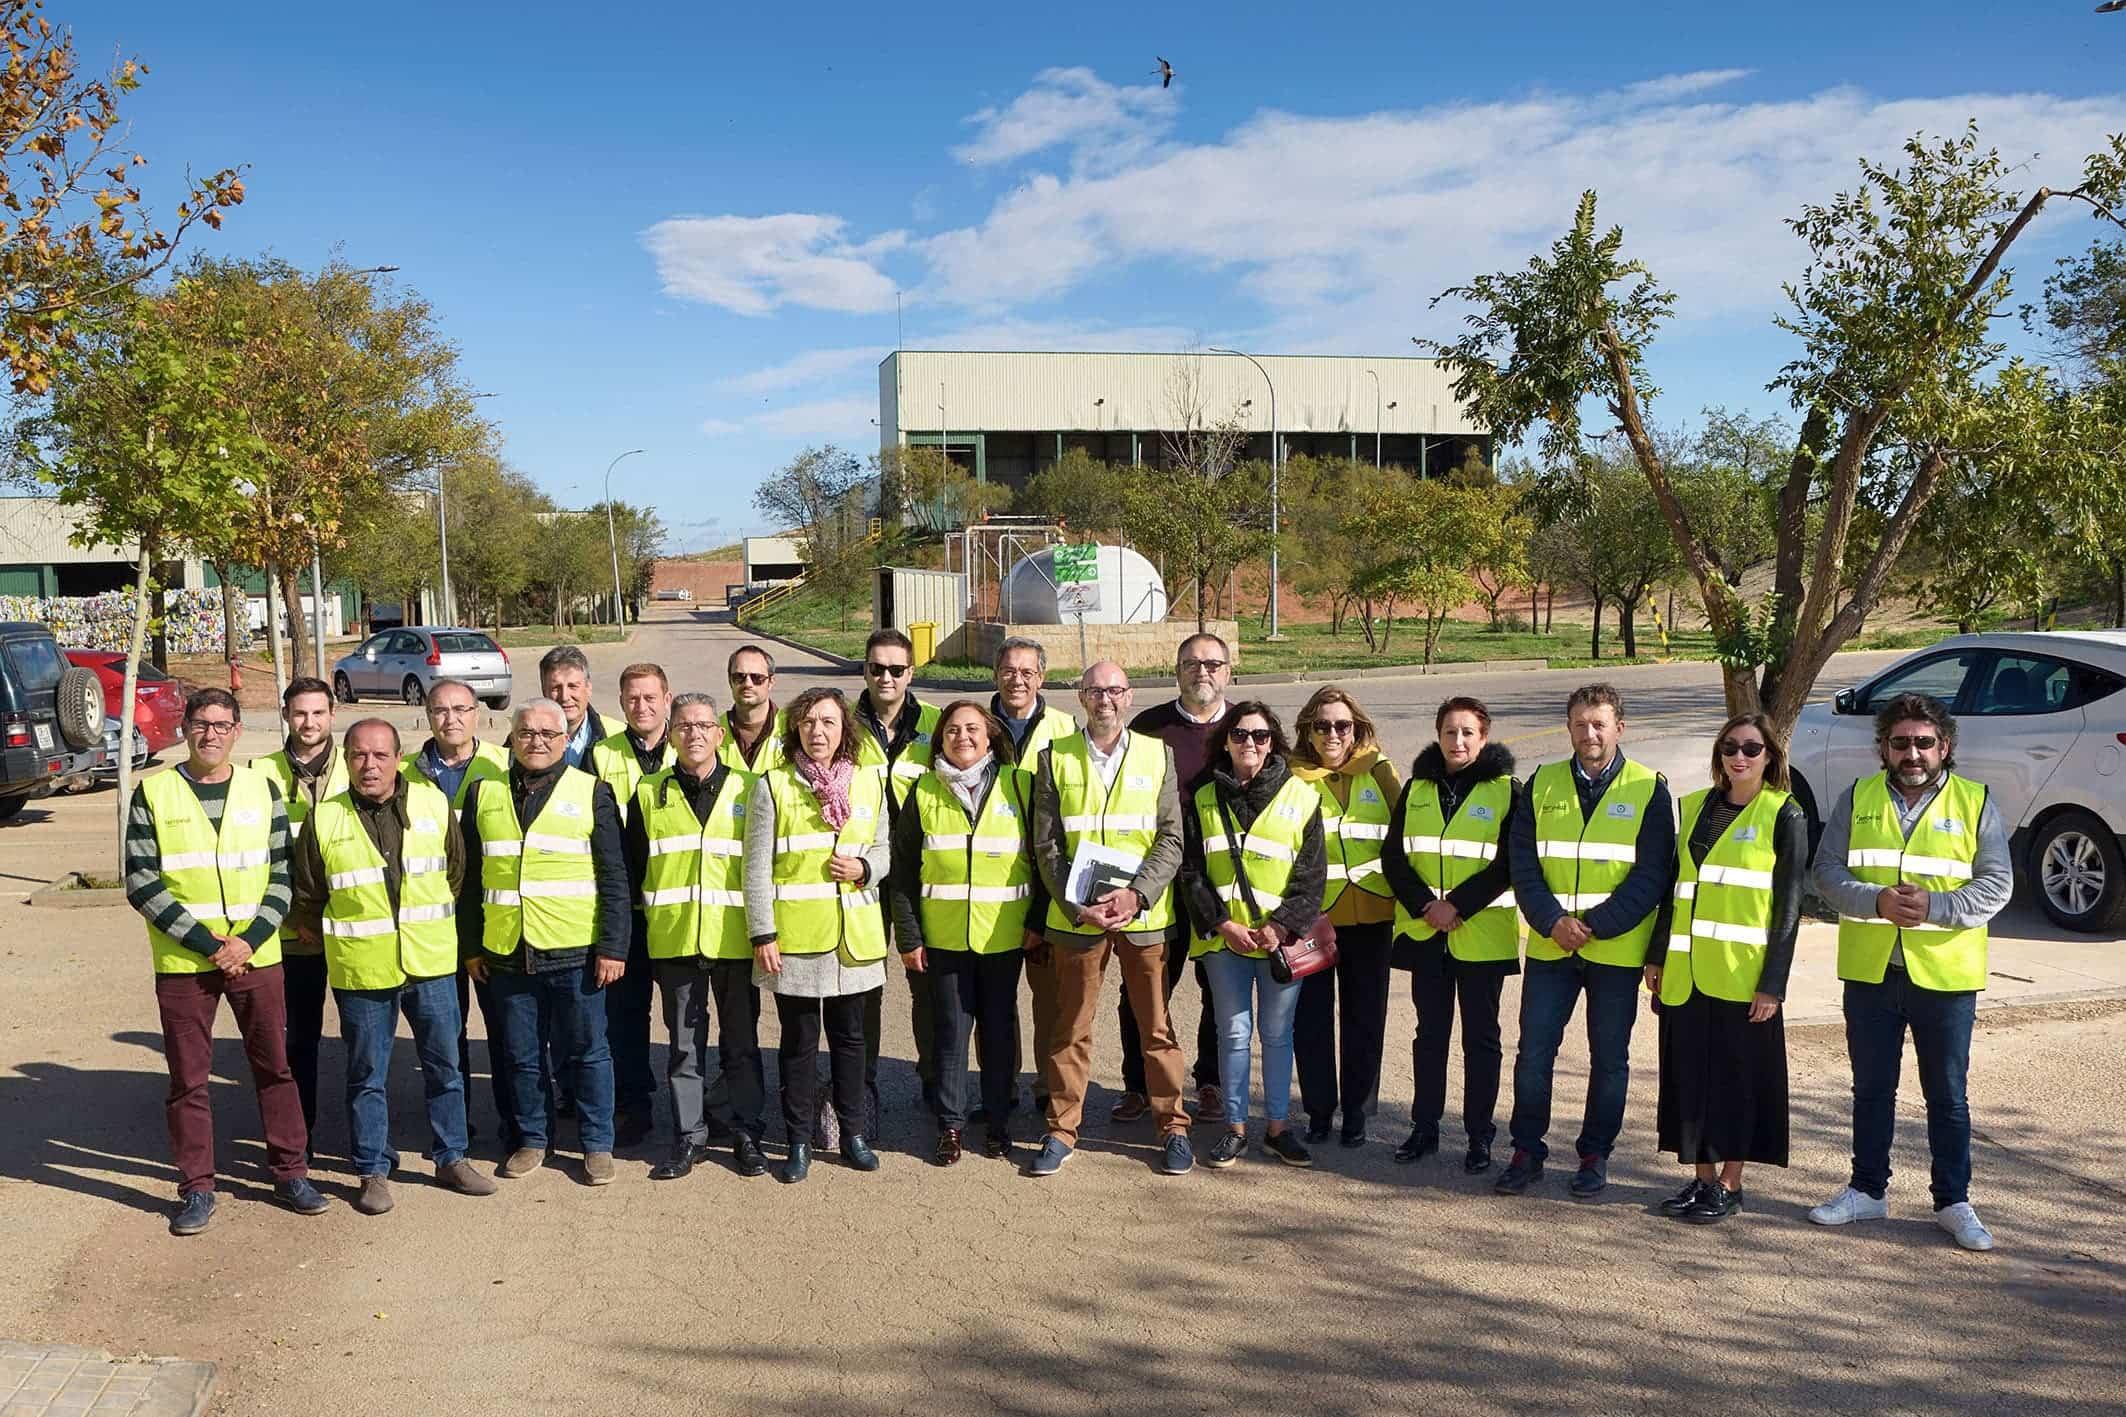 20191109 Pleno y visita a la planta001 Comsermancha - La Corporación de Comsermancha visita la planta de RSU